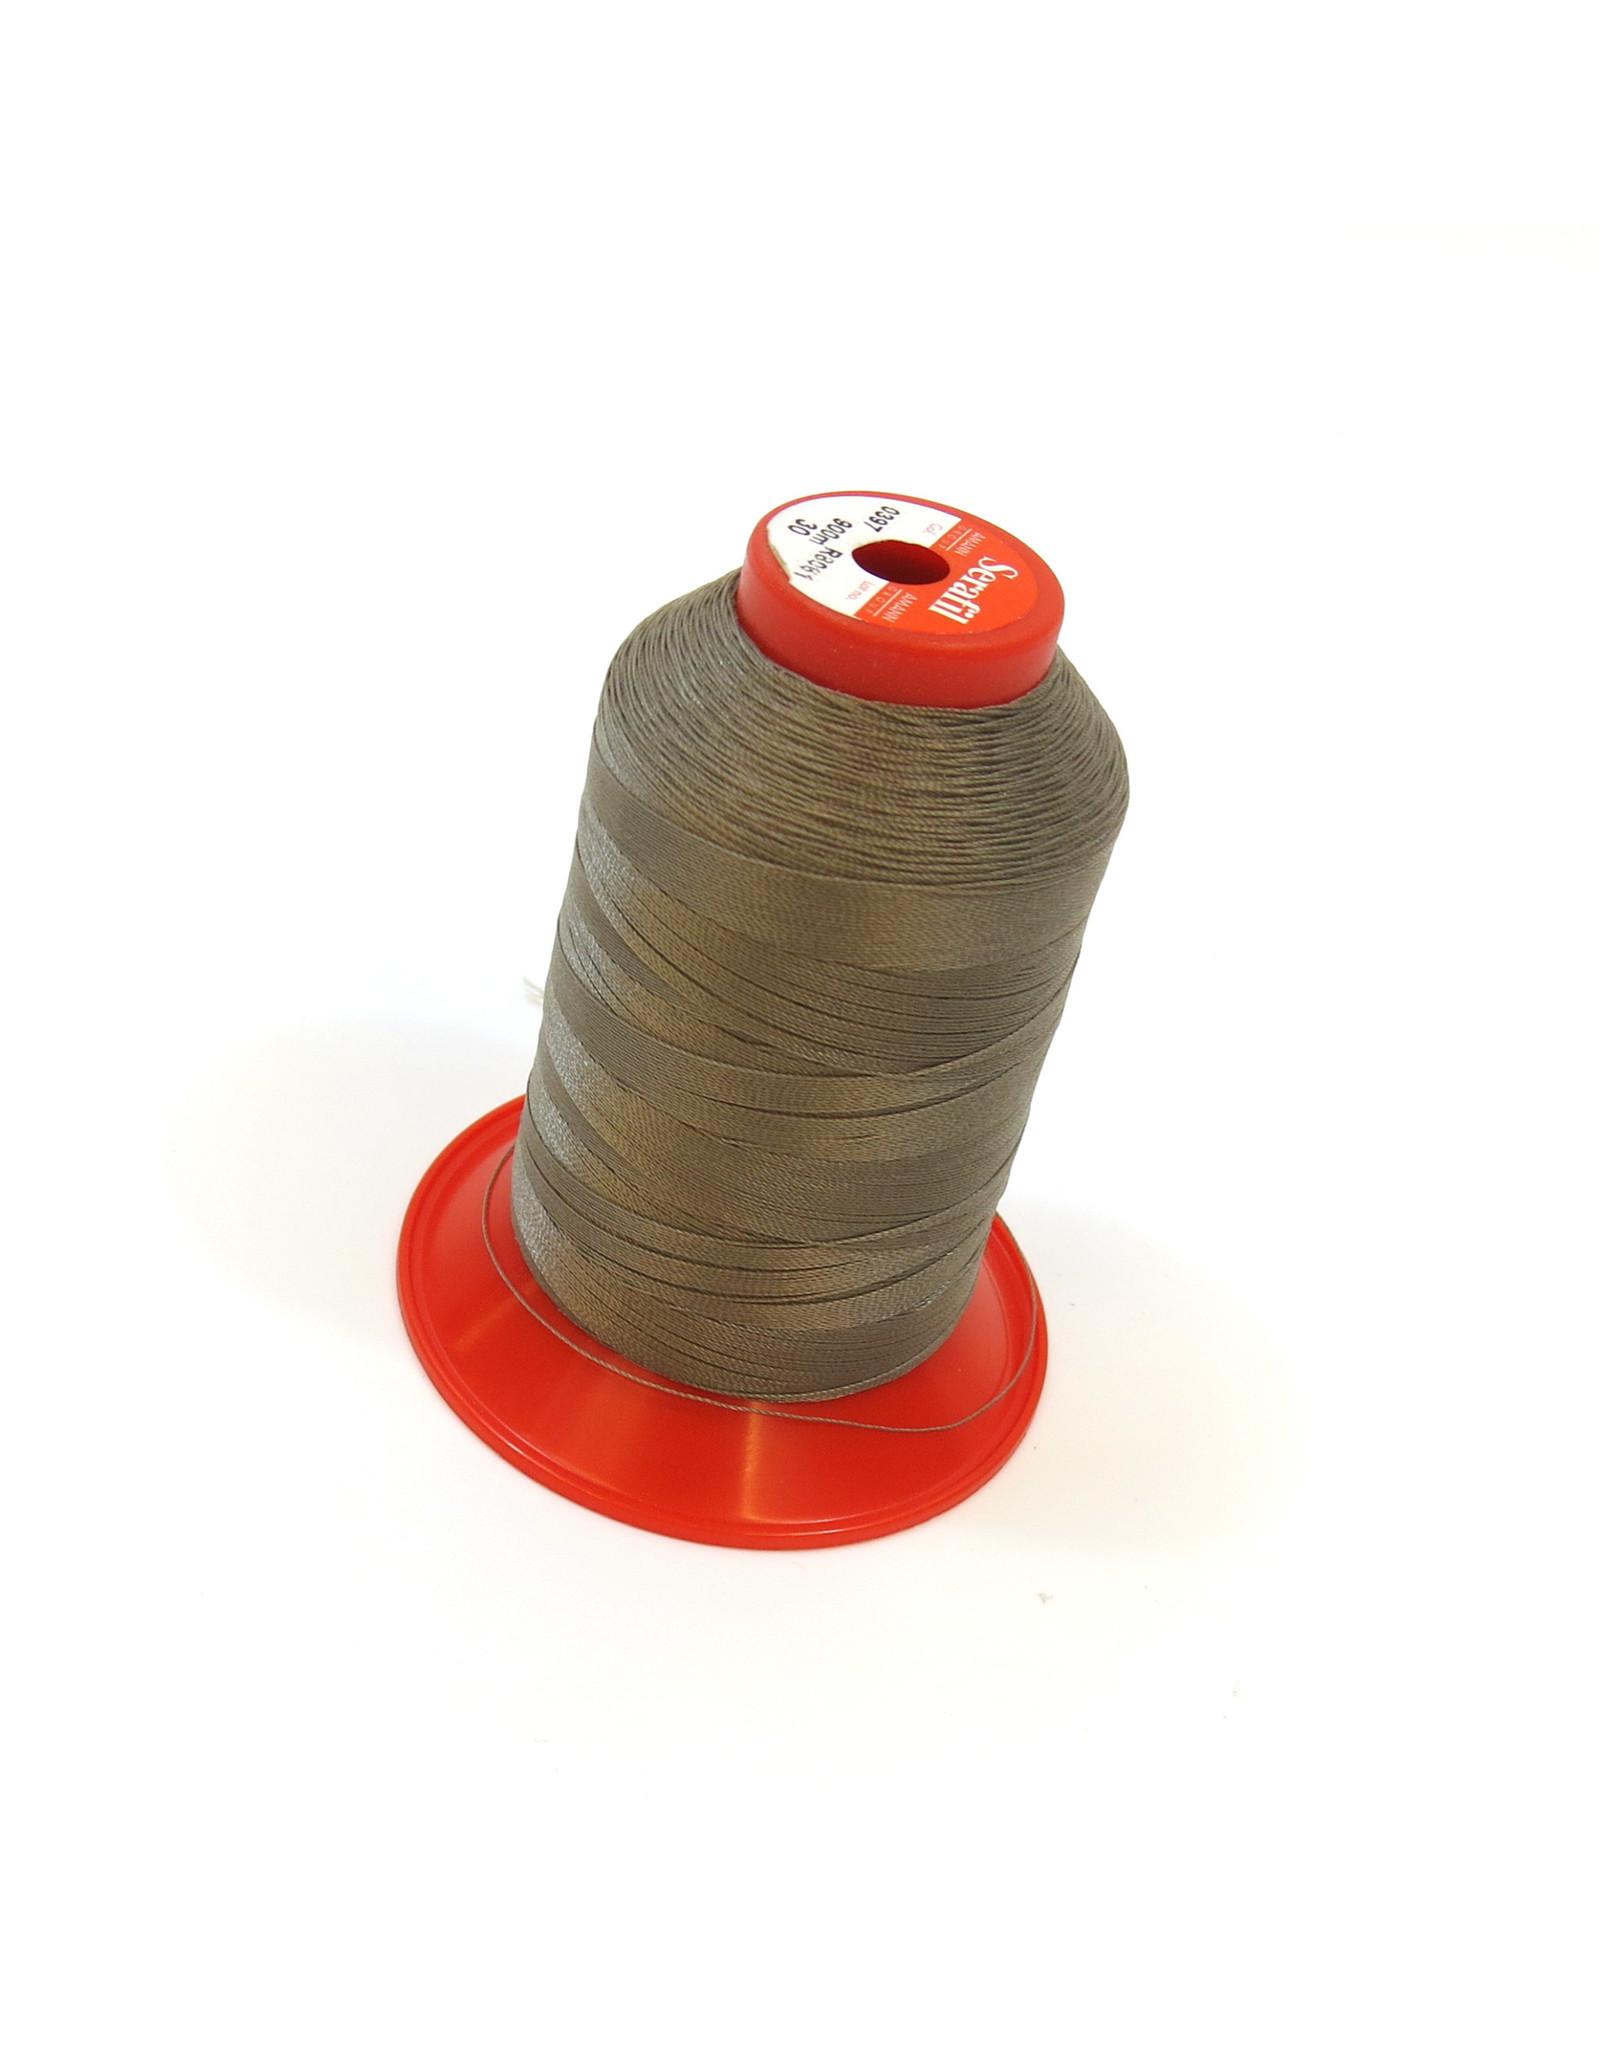 Serafil machine sewing thread 0397